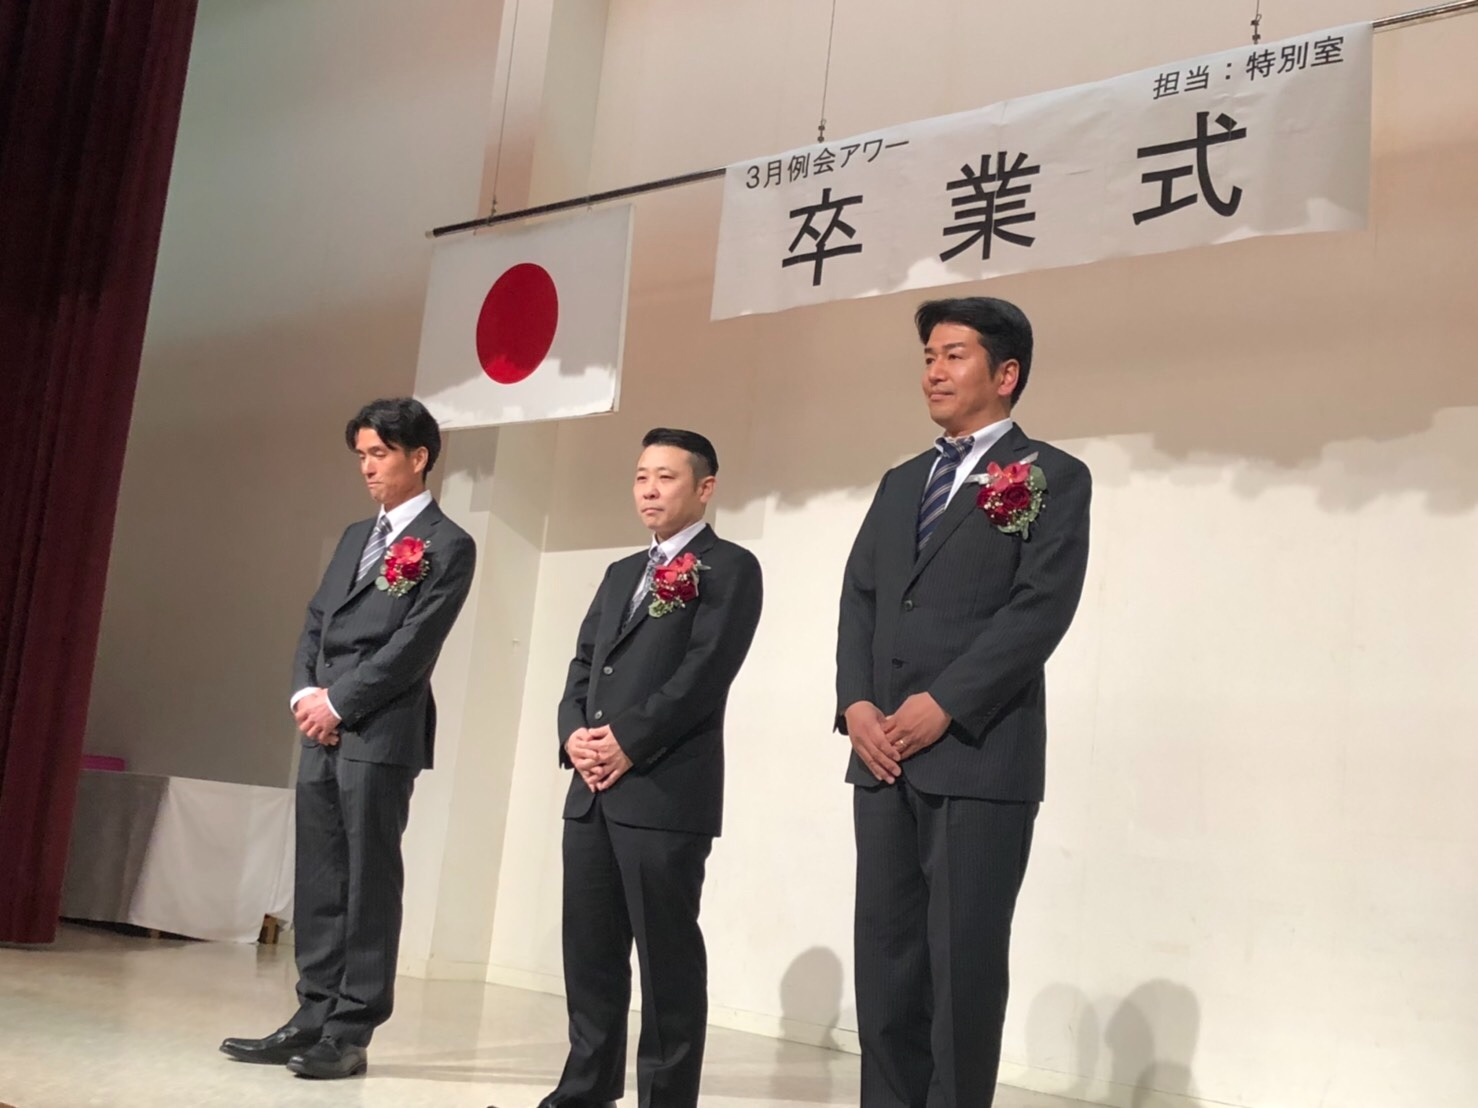 f:id:masanori-kato1972:20190330102124j:image